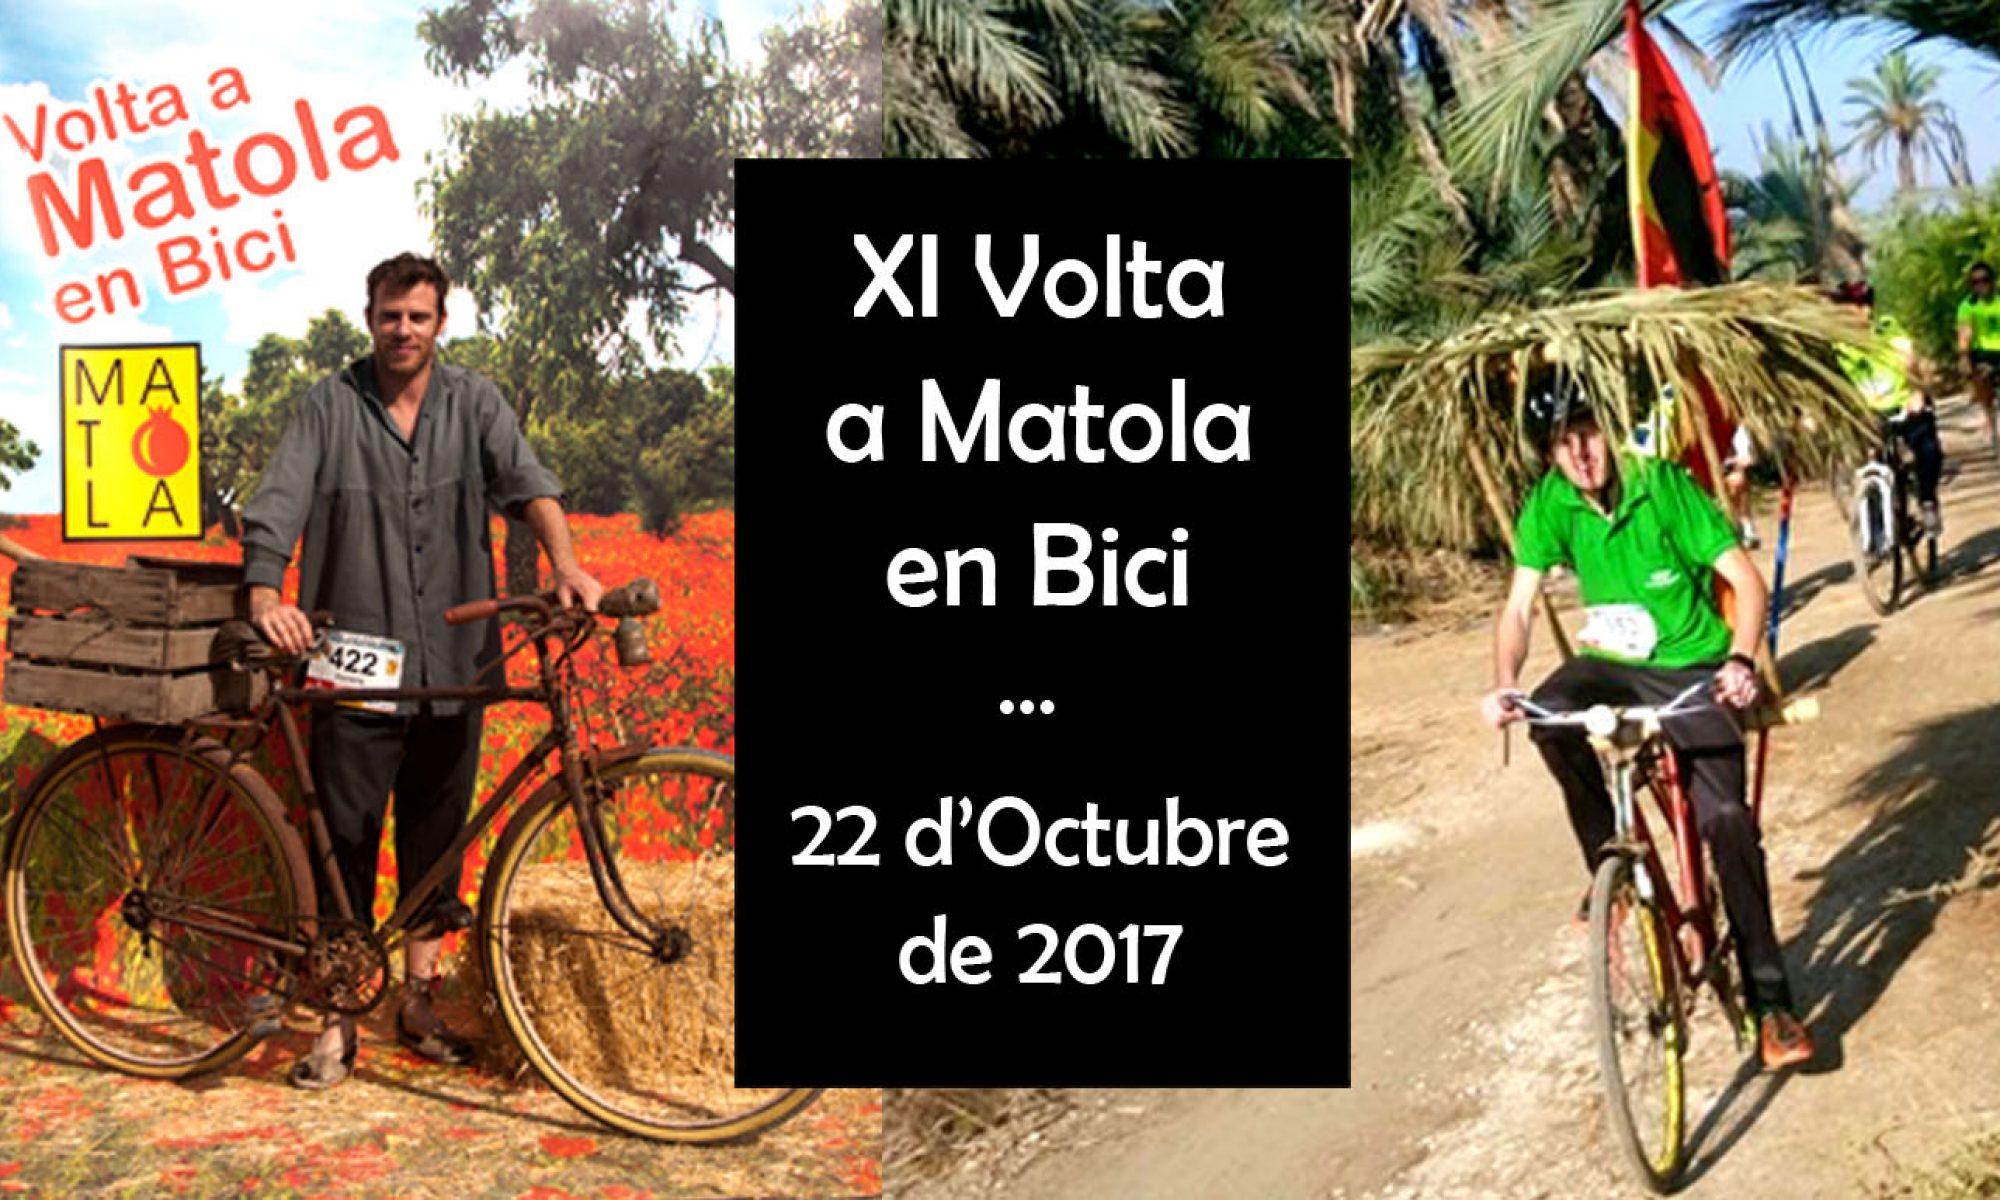 www.matola.es